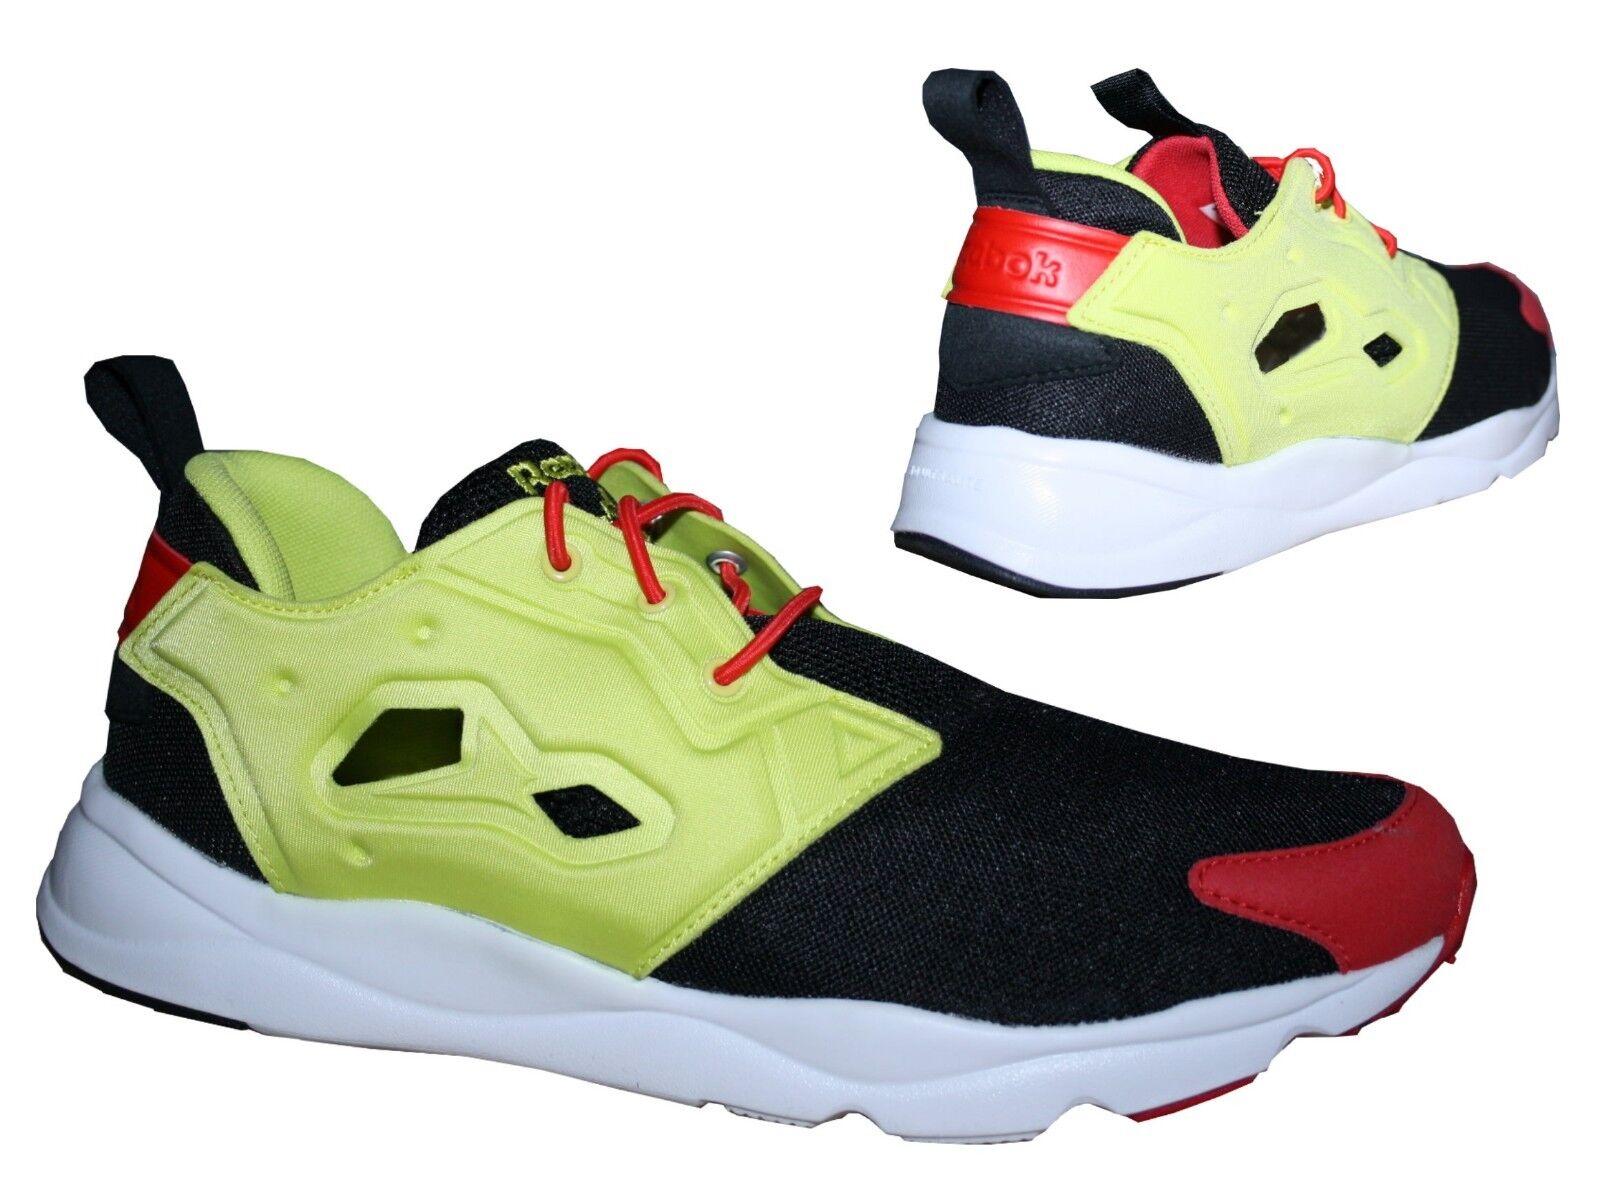 Reebok FuryLite Herren Sneaker Classic Sportschuhe Turnschuhe Fitness Schuhe